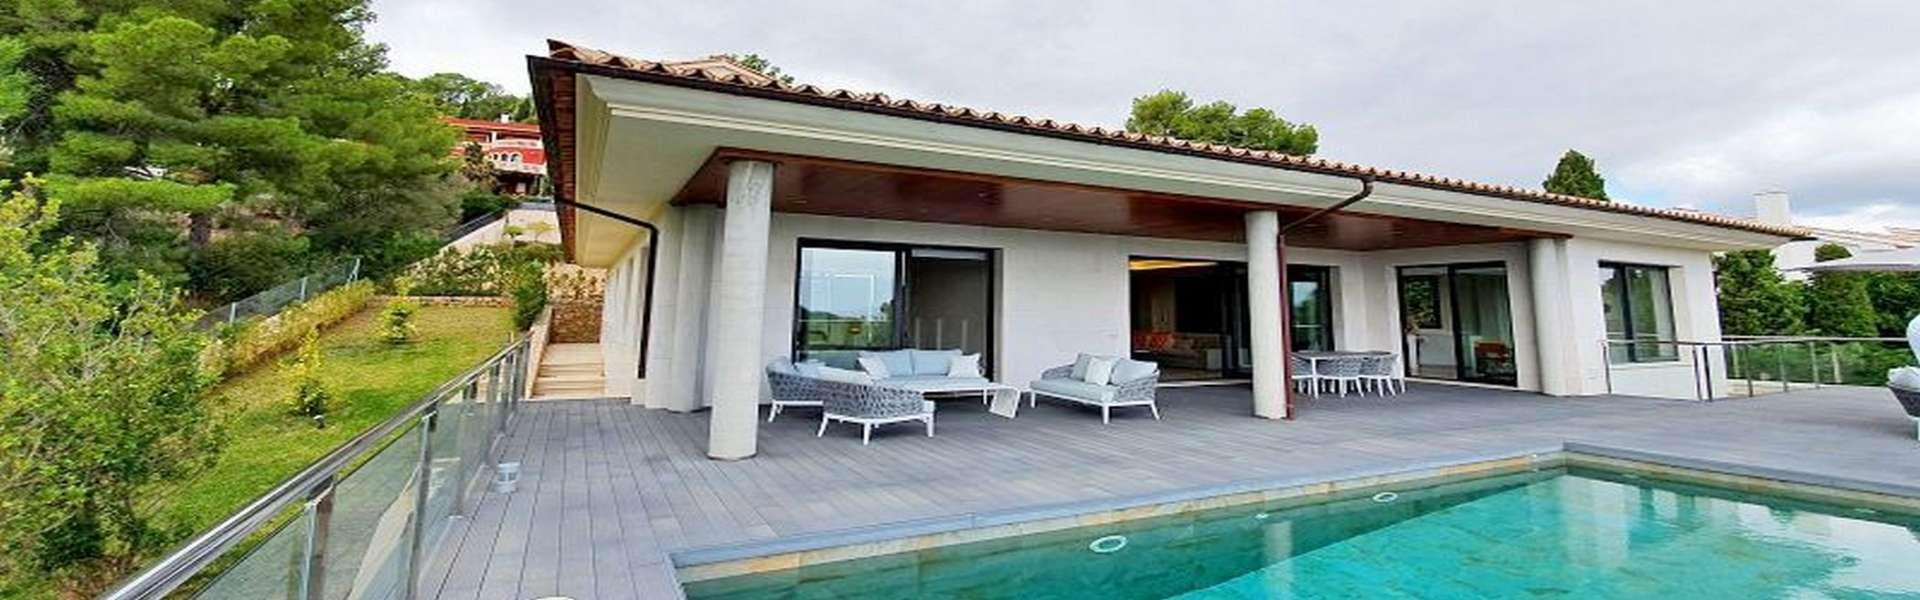 Palma/Son Vida - Modern villa for sale